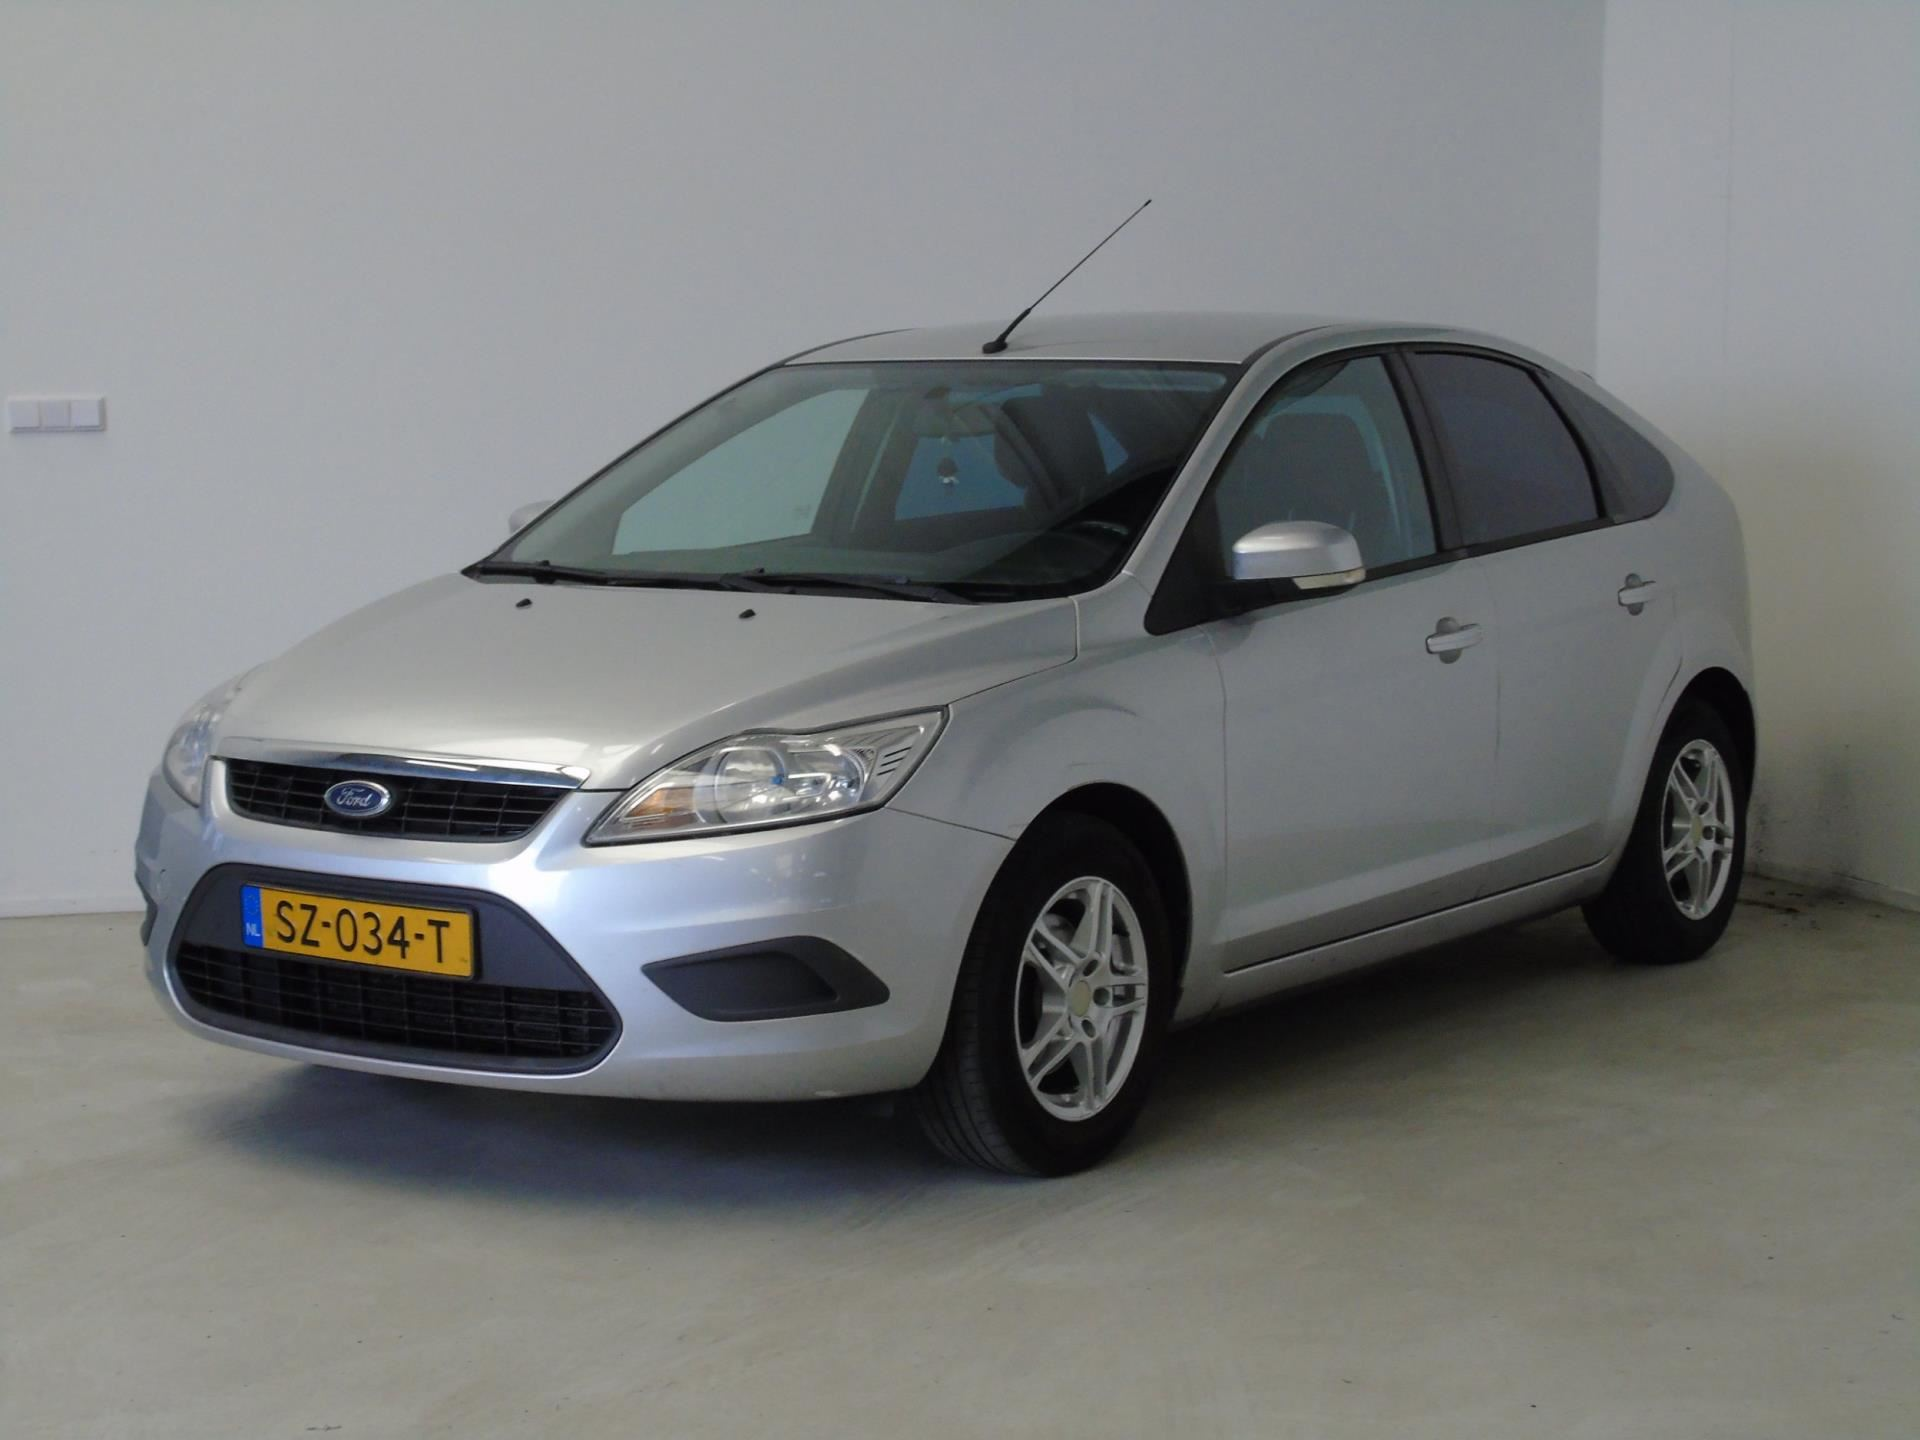 Ford Focus occasion - van Dijk auto's